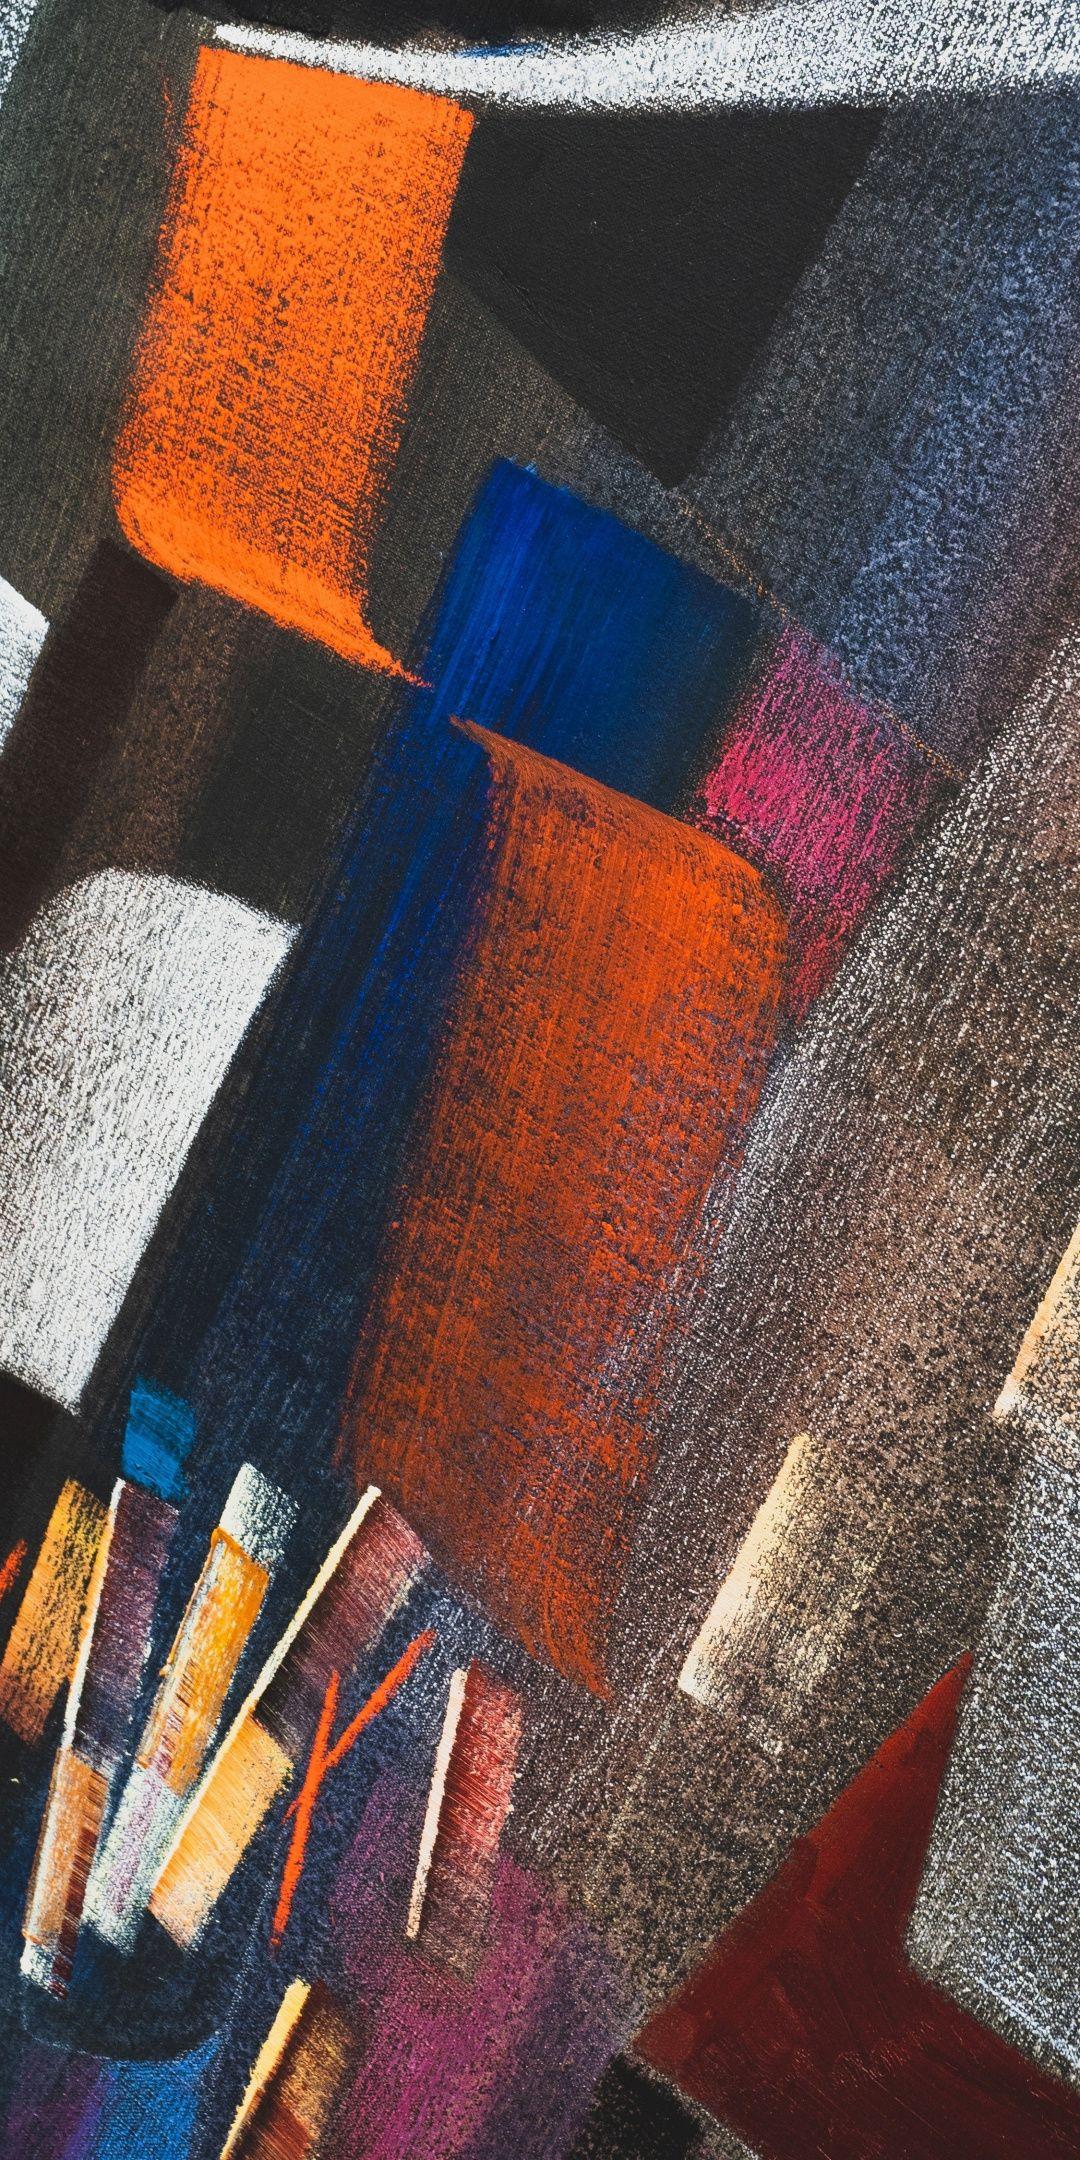 Artwork stripes, colorful, spots, 1080x2160 wallpaper